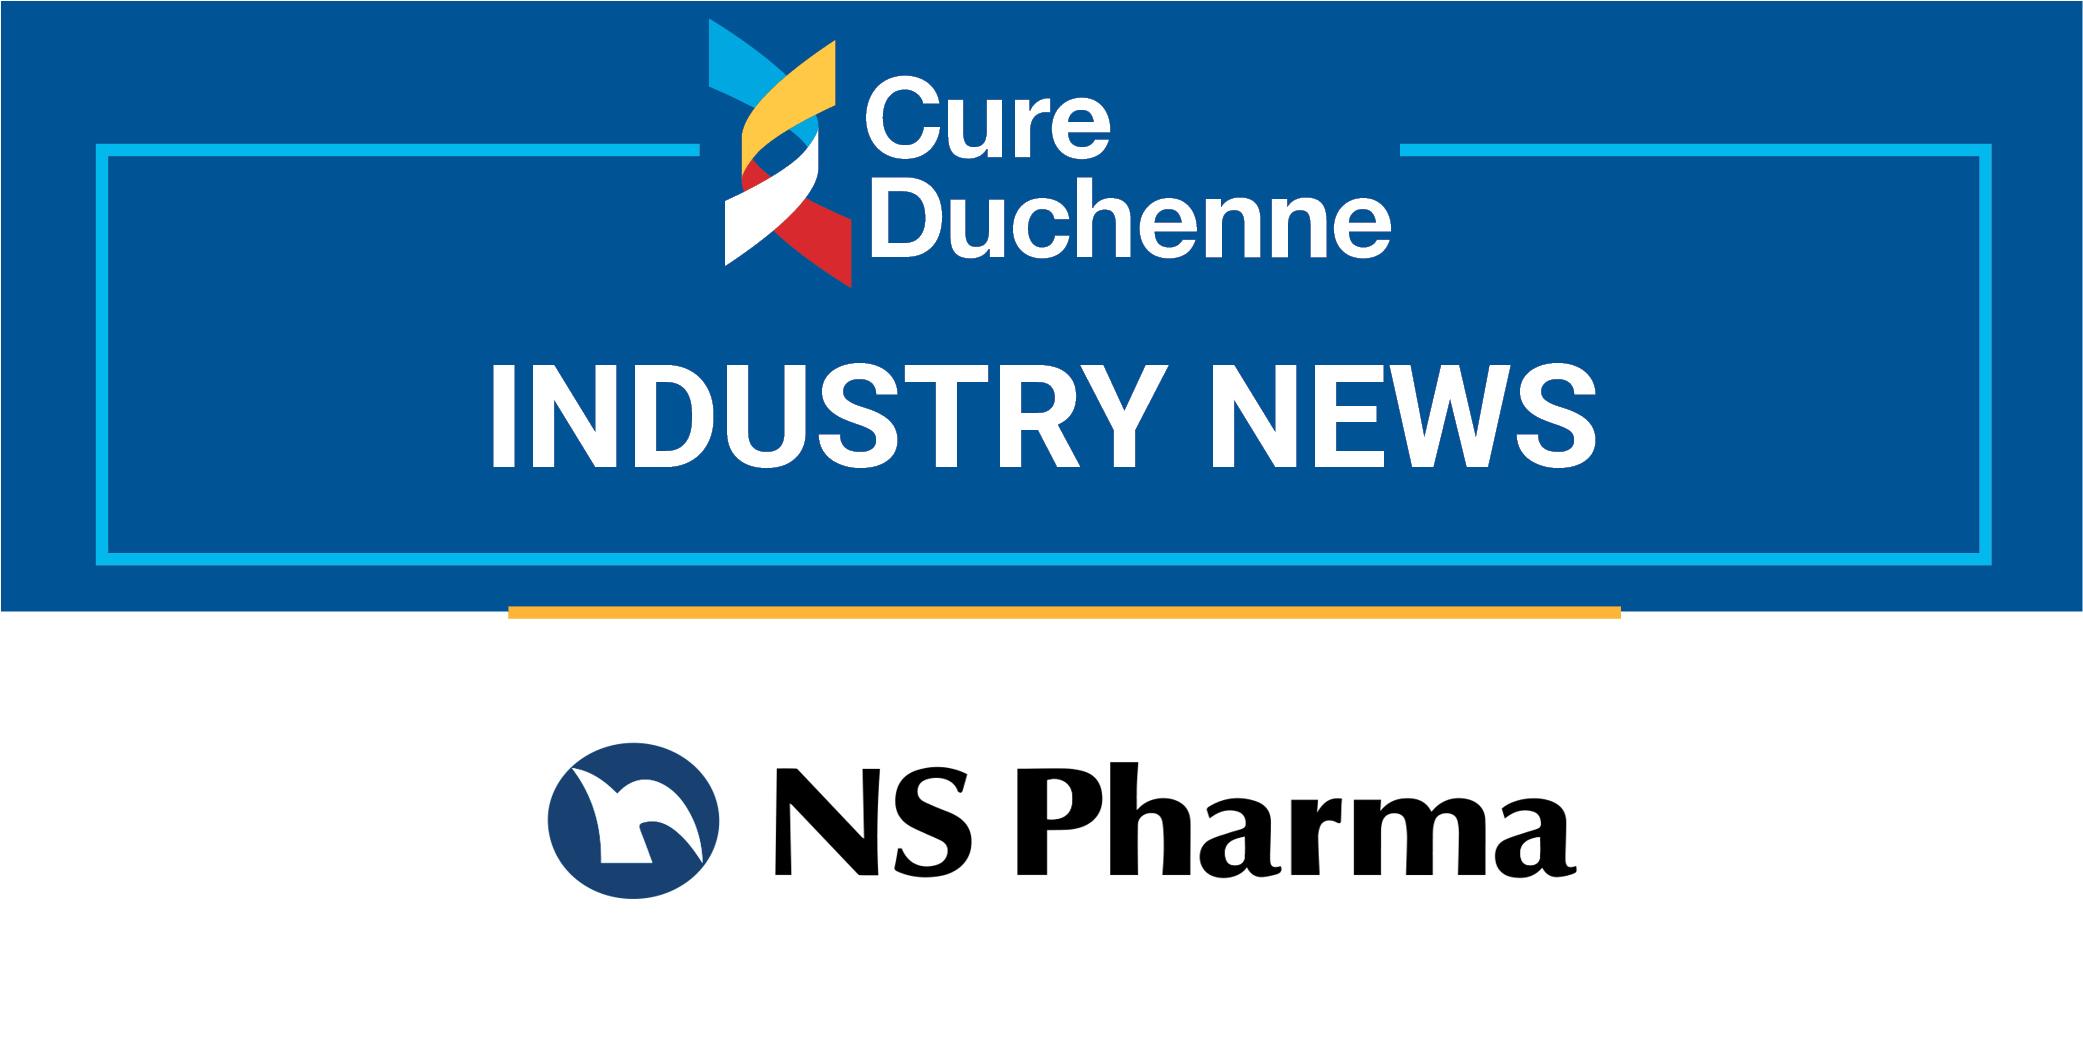 news-header-image-ns-pharma